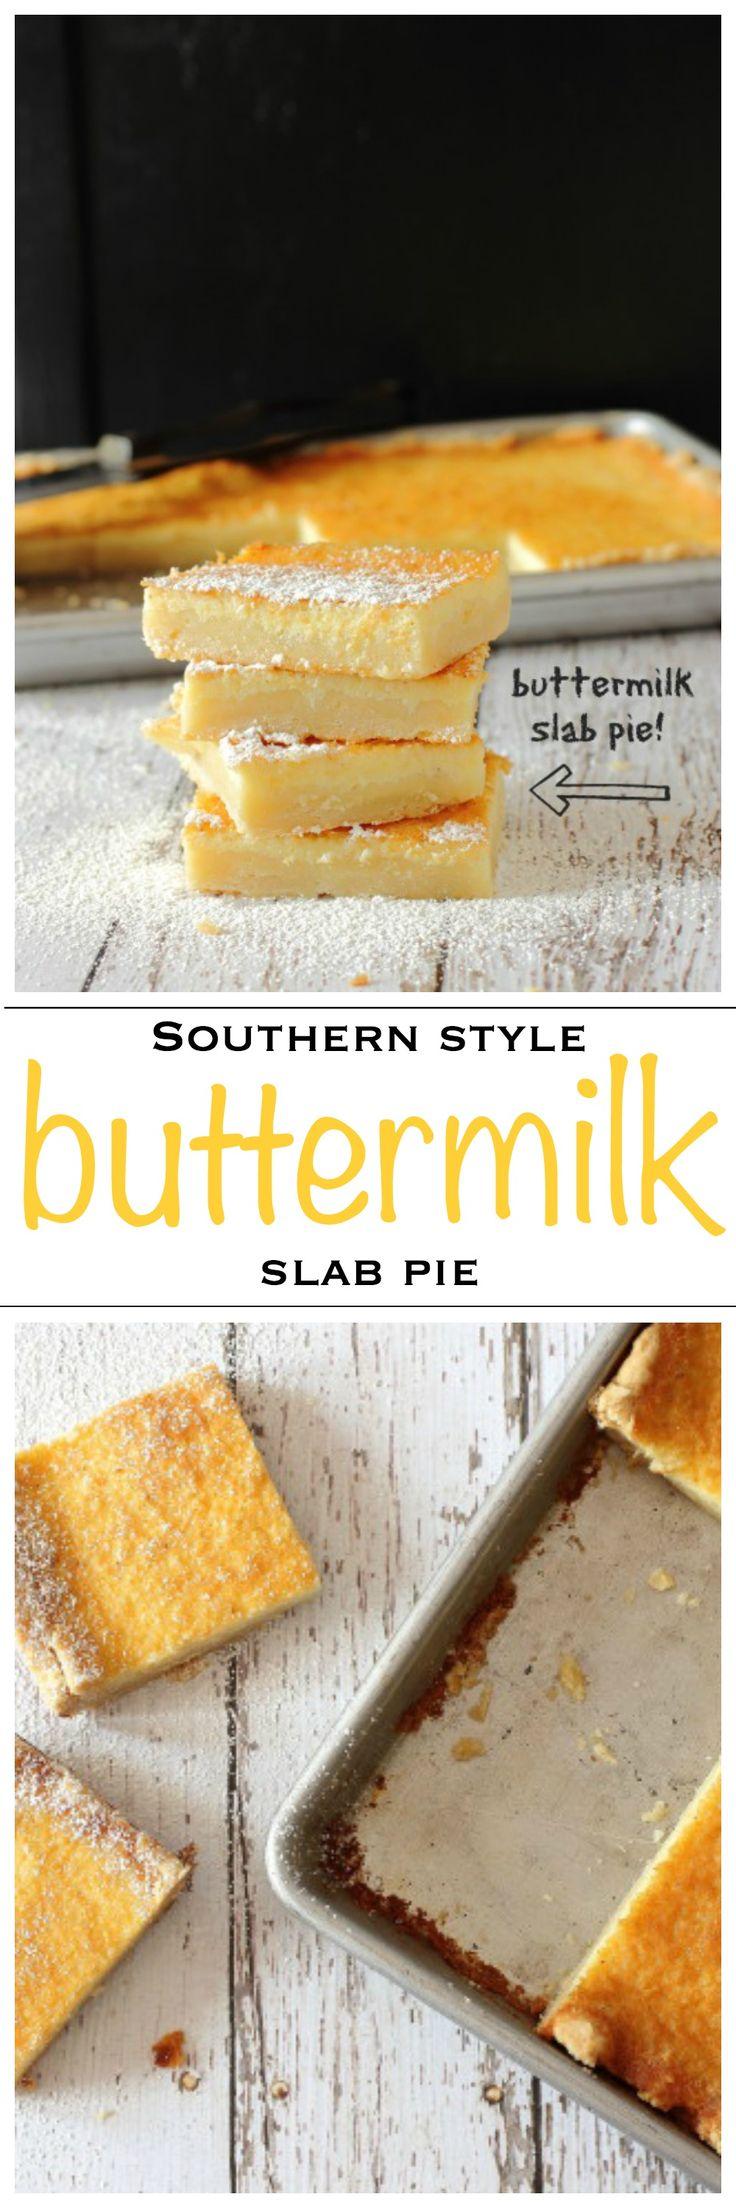 Southern Style Creamy Buttermilk Slab Pie | Foodness Gracious